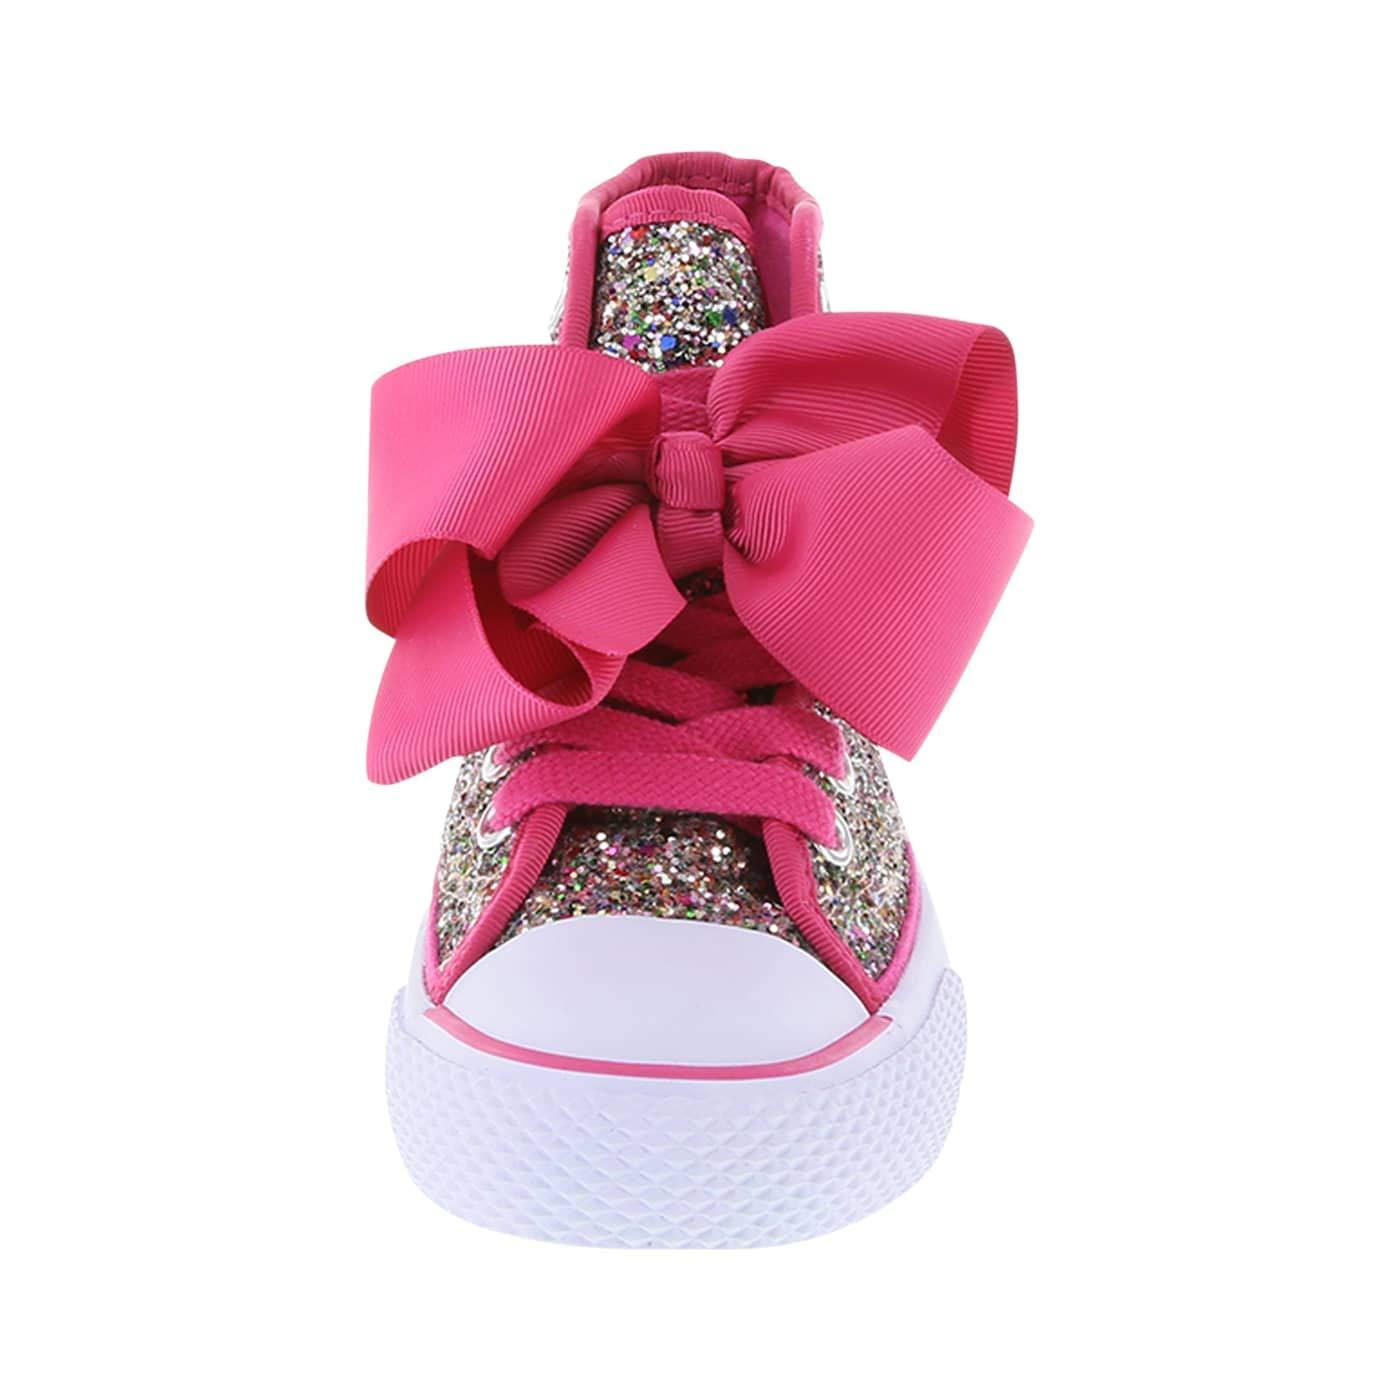 Nickelodeon Shoes Girls JoJo Legacee Sneaker High-Top 079435-Parent